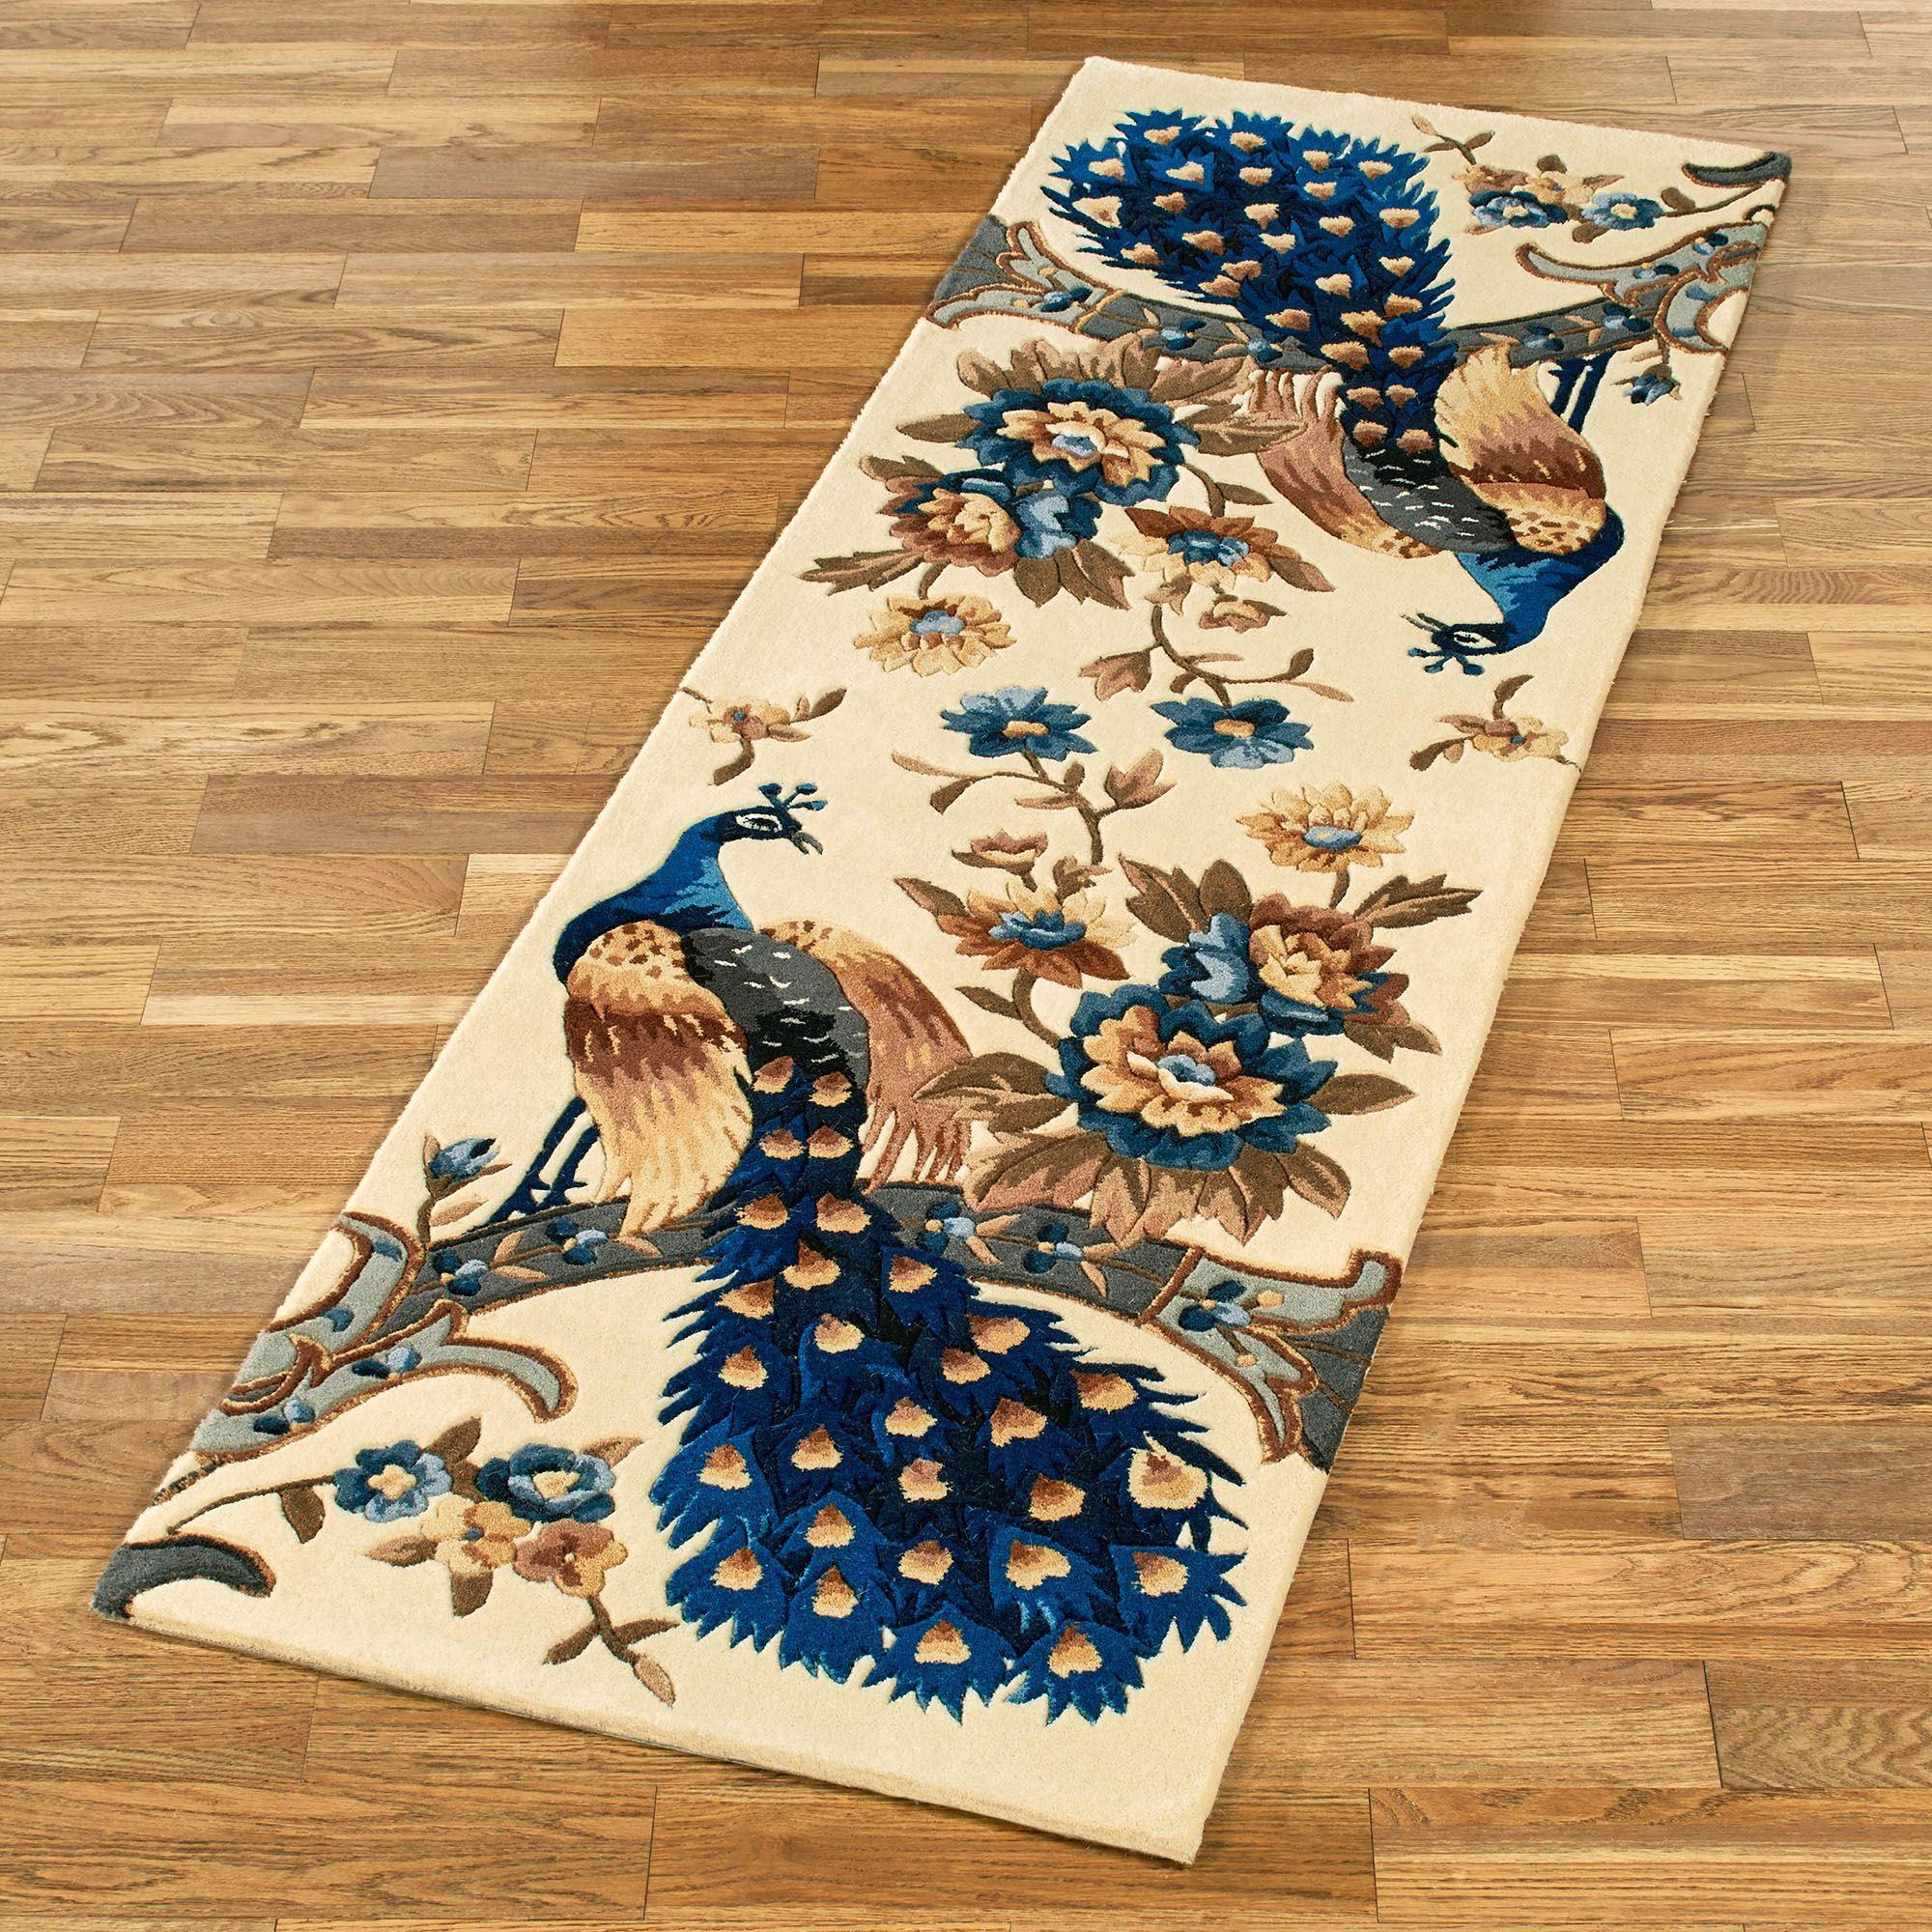 habidecor products peacock linen dynasty flandb new bath com bathroom rug